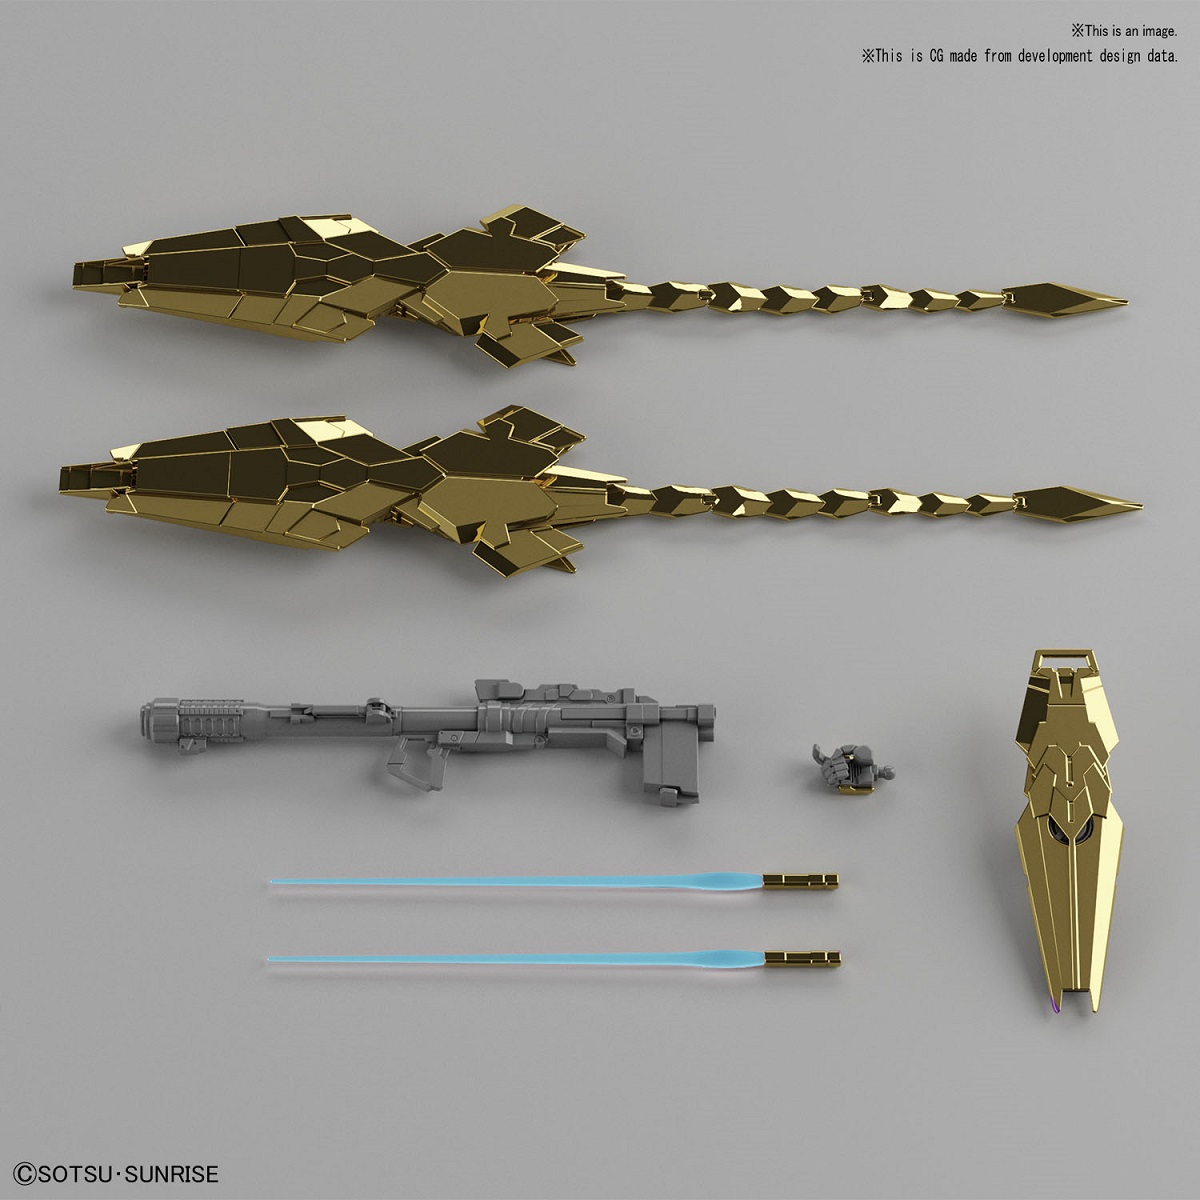 Phenex Unicorn Mode Gold Coating Ver Gundam Narrative HG 1/144 Model Kit